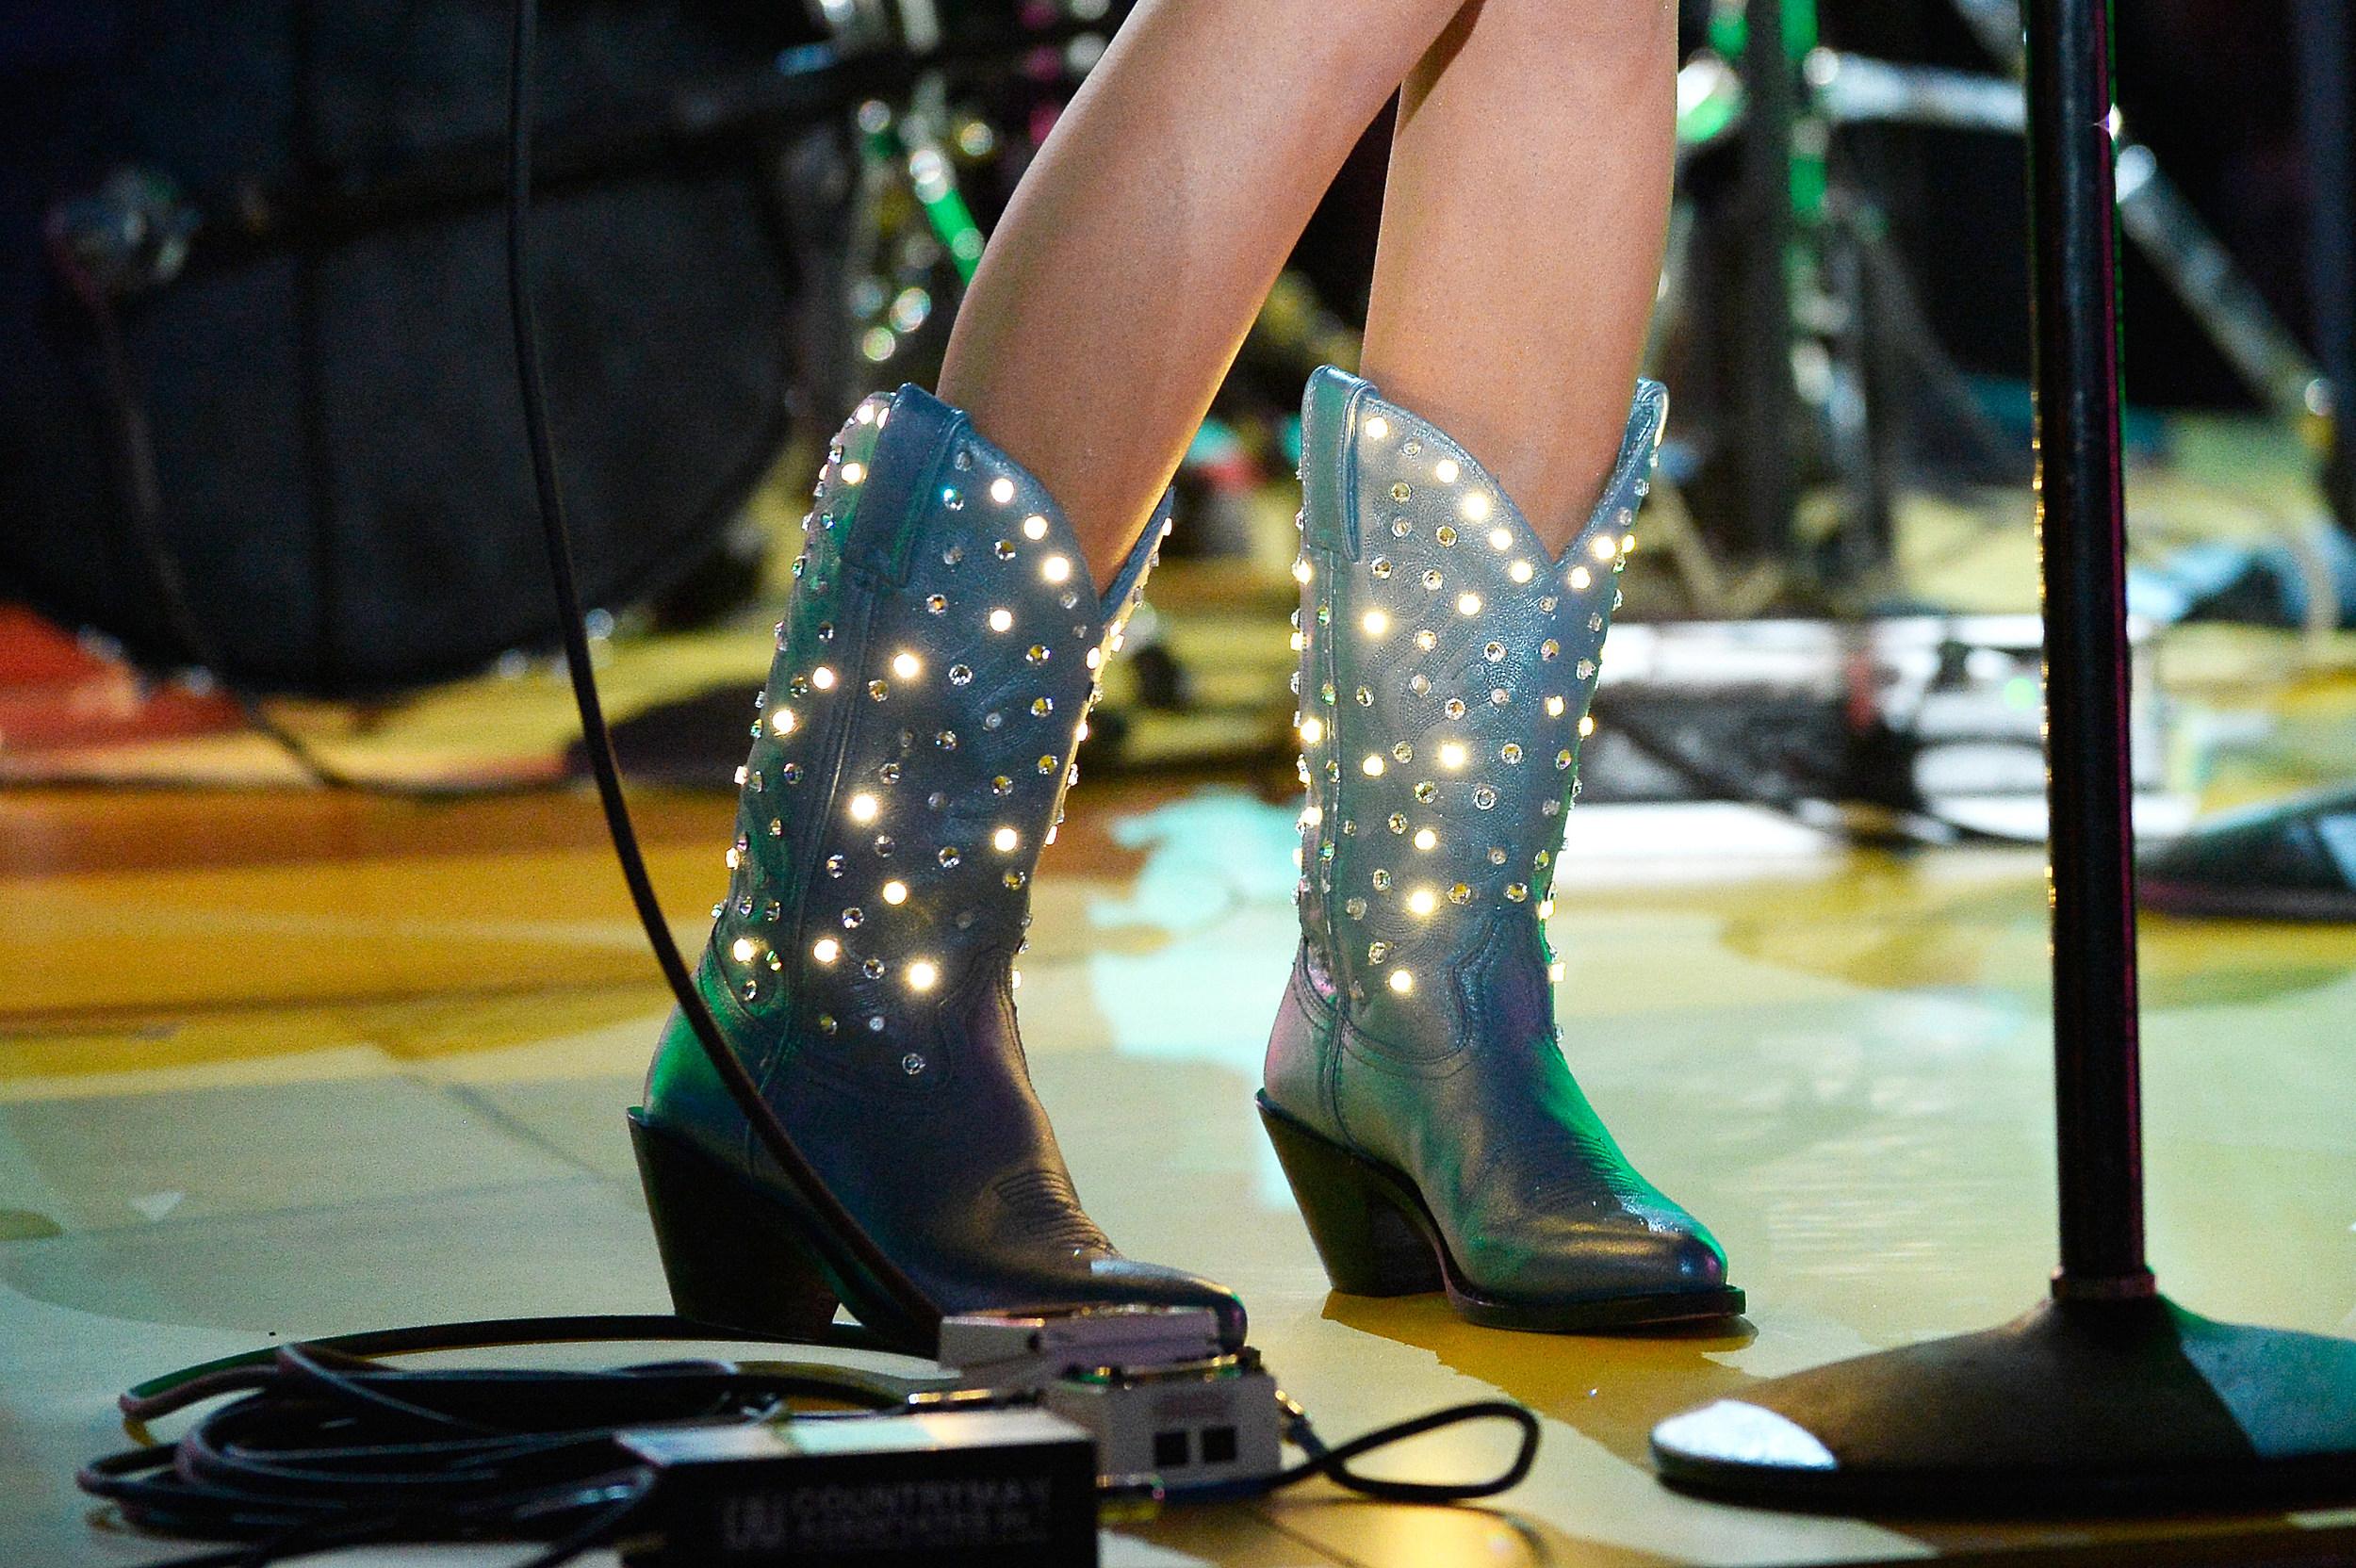 Own Kacey Musgraves Light-Up Boots